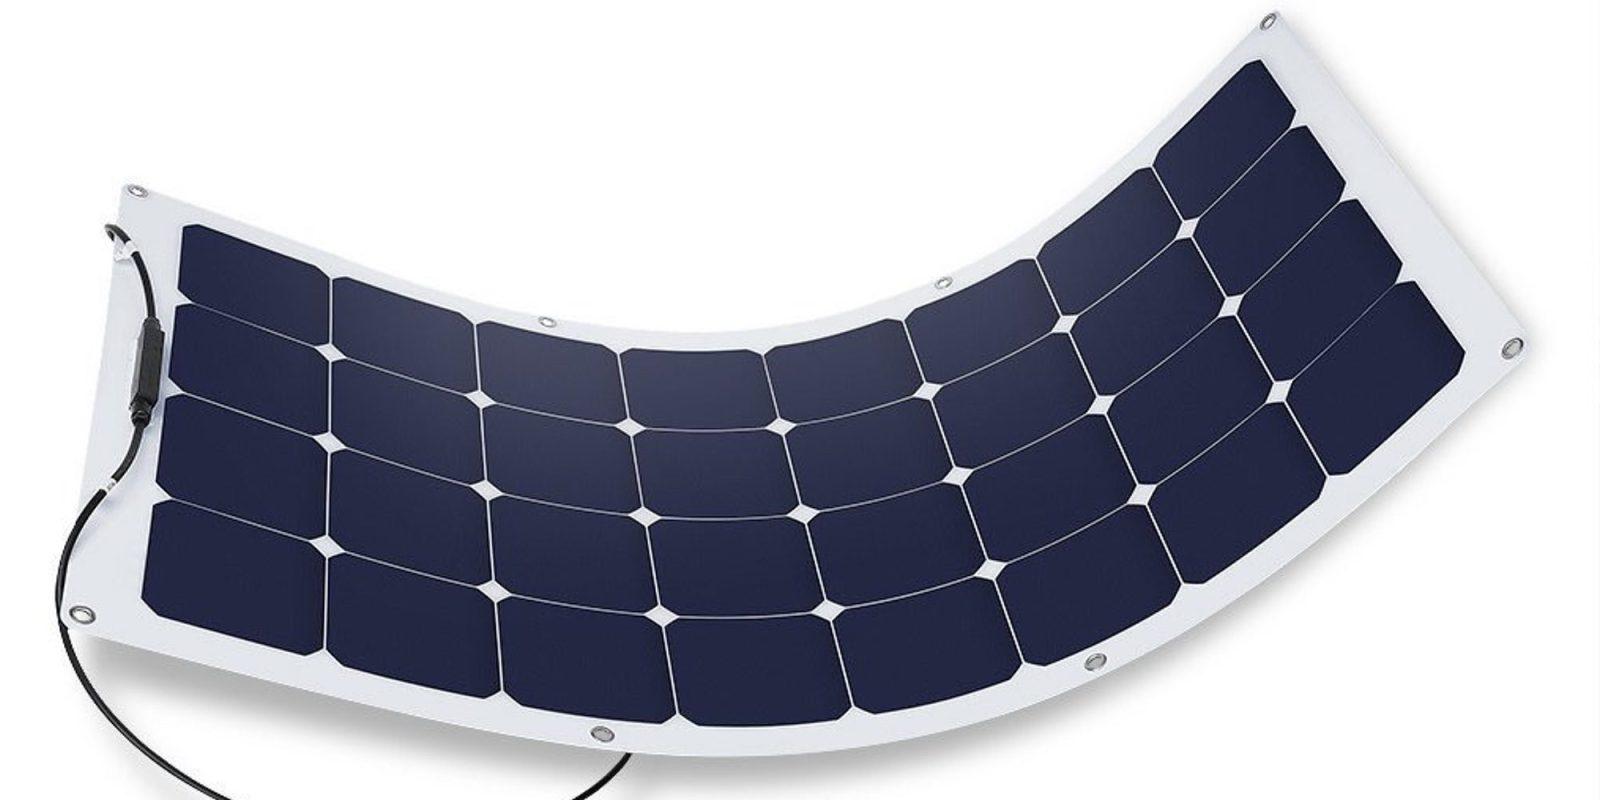 Green Deals Suaoki 100w 18v Solar Panel 99 Shipped More